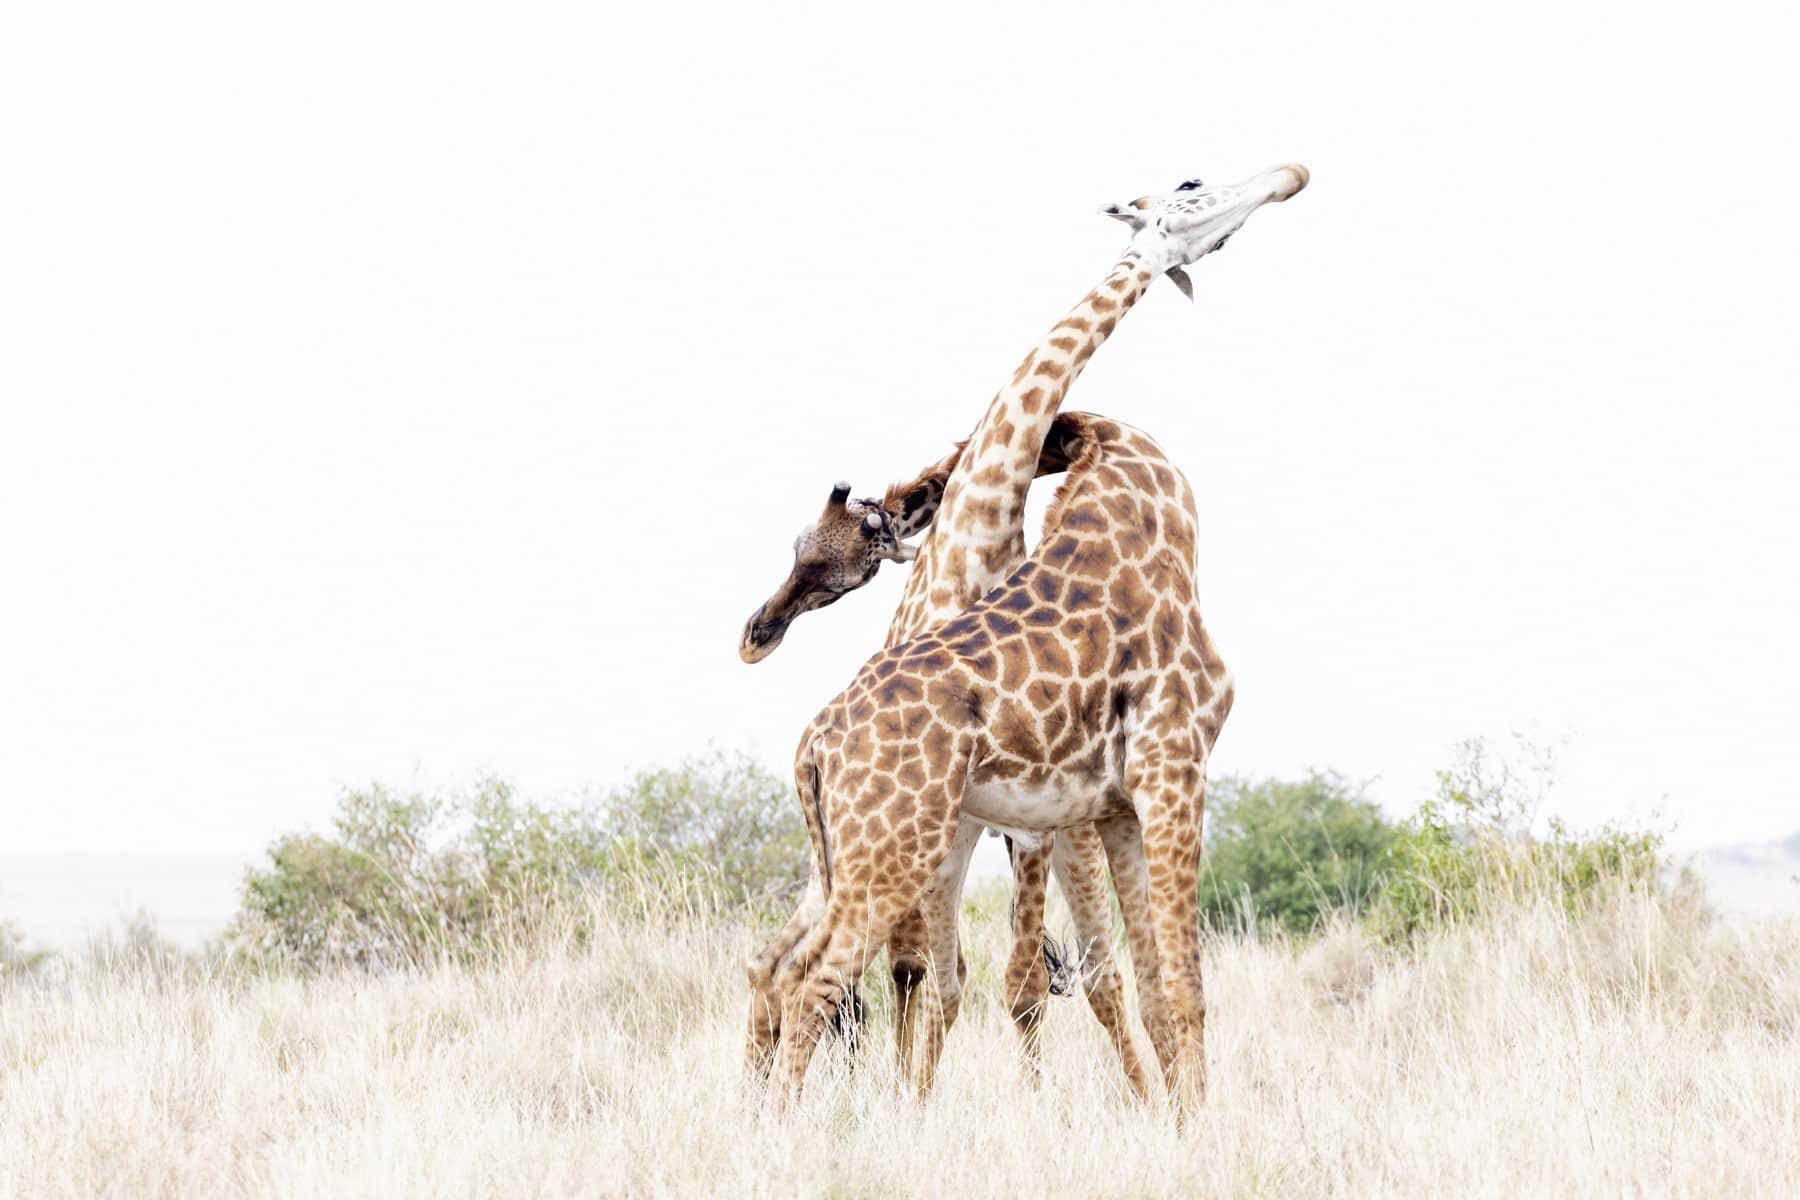 Dance of the Giraffes